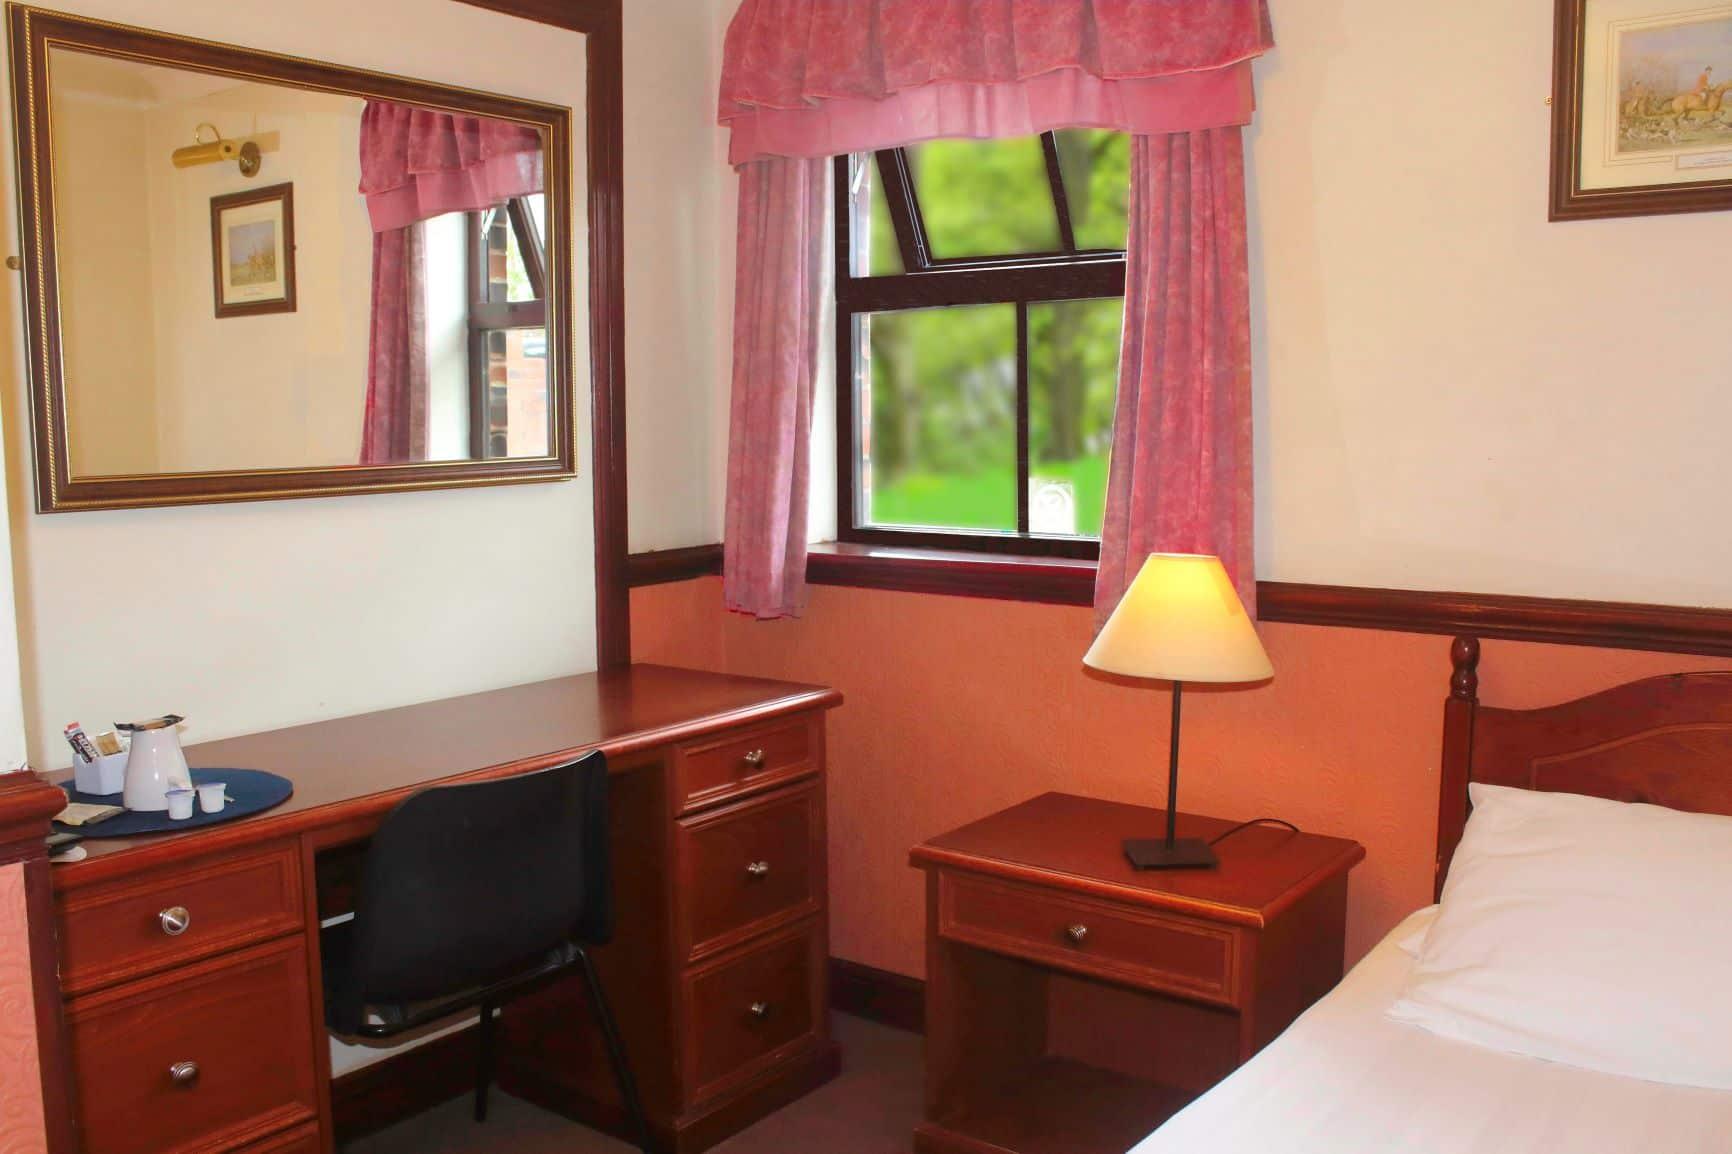 butlers hotel room